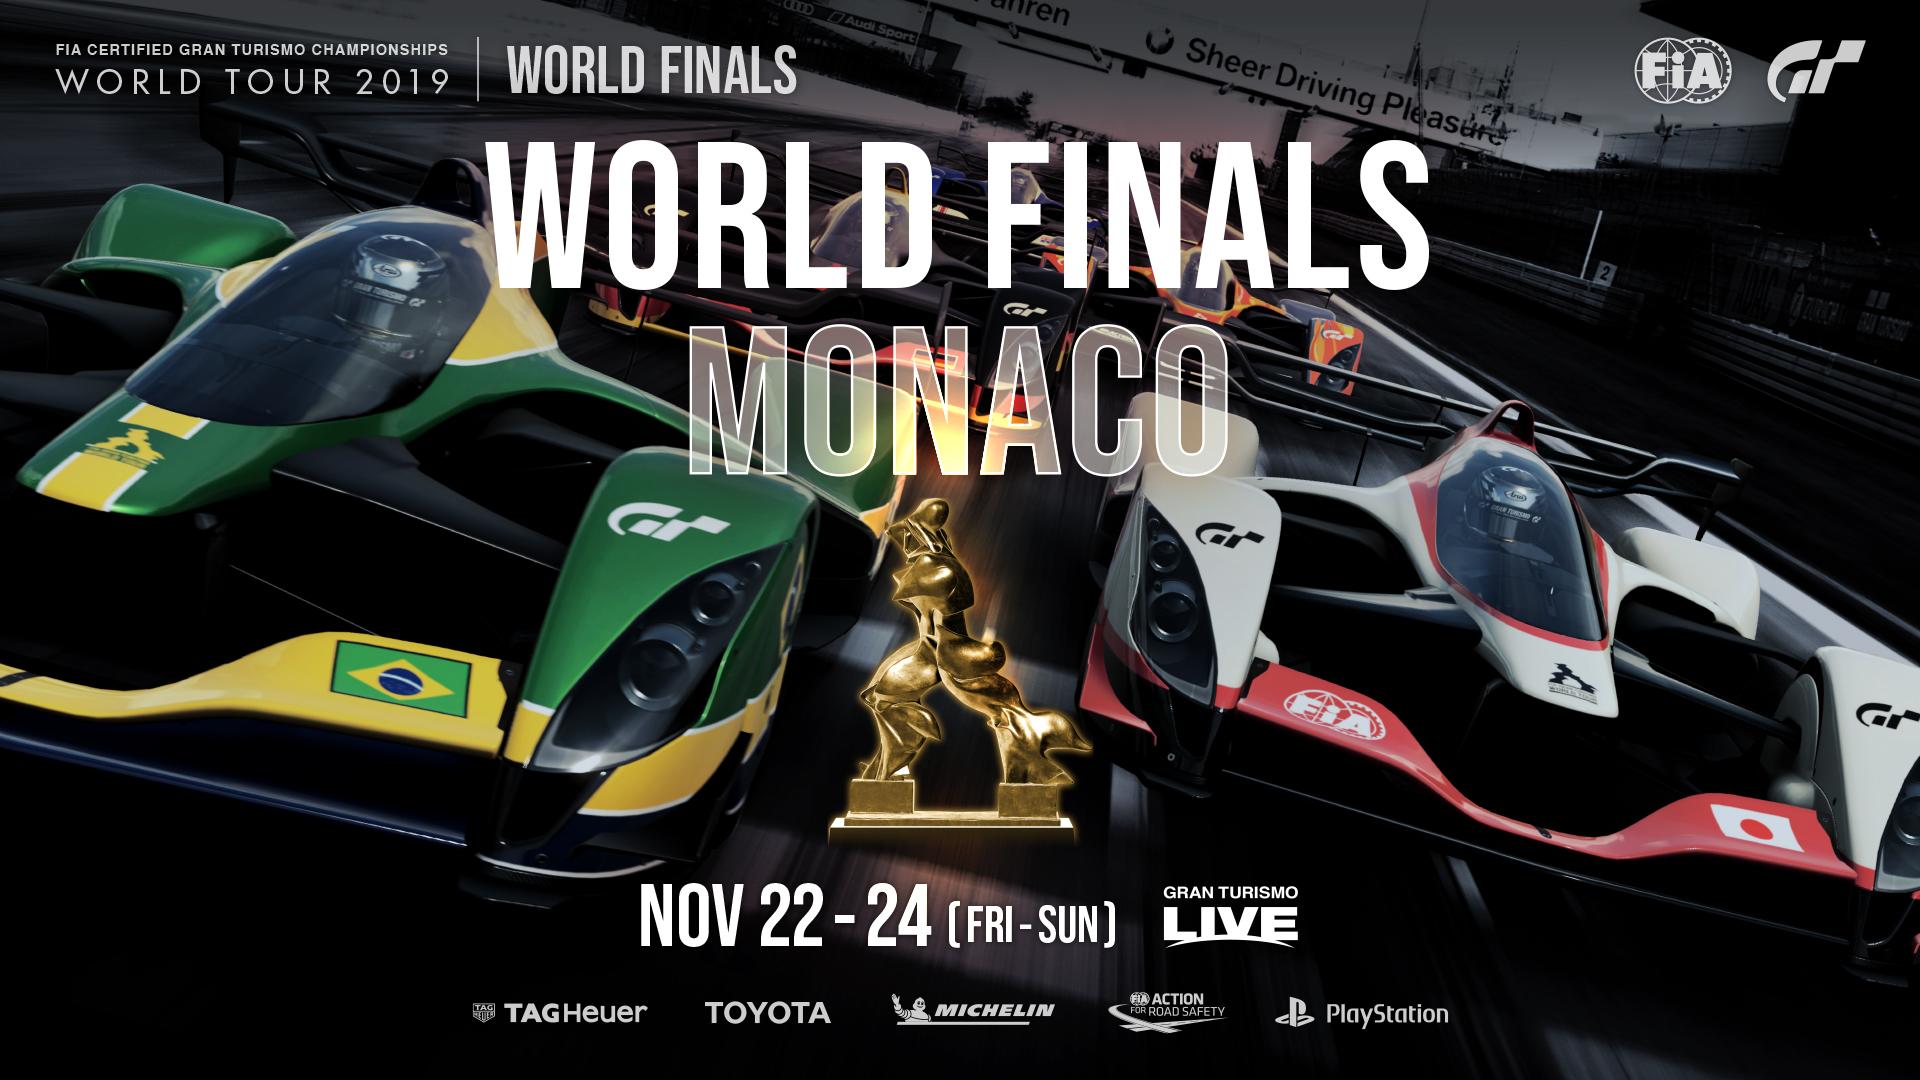 Gran Turismo Championship on PS4